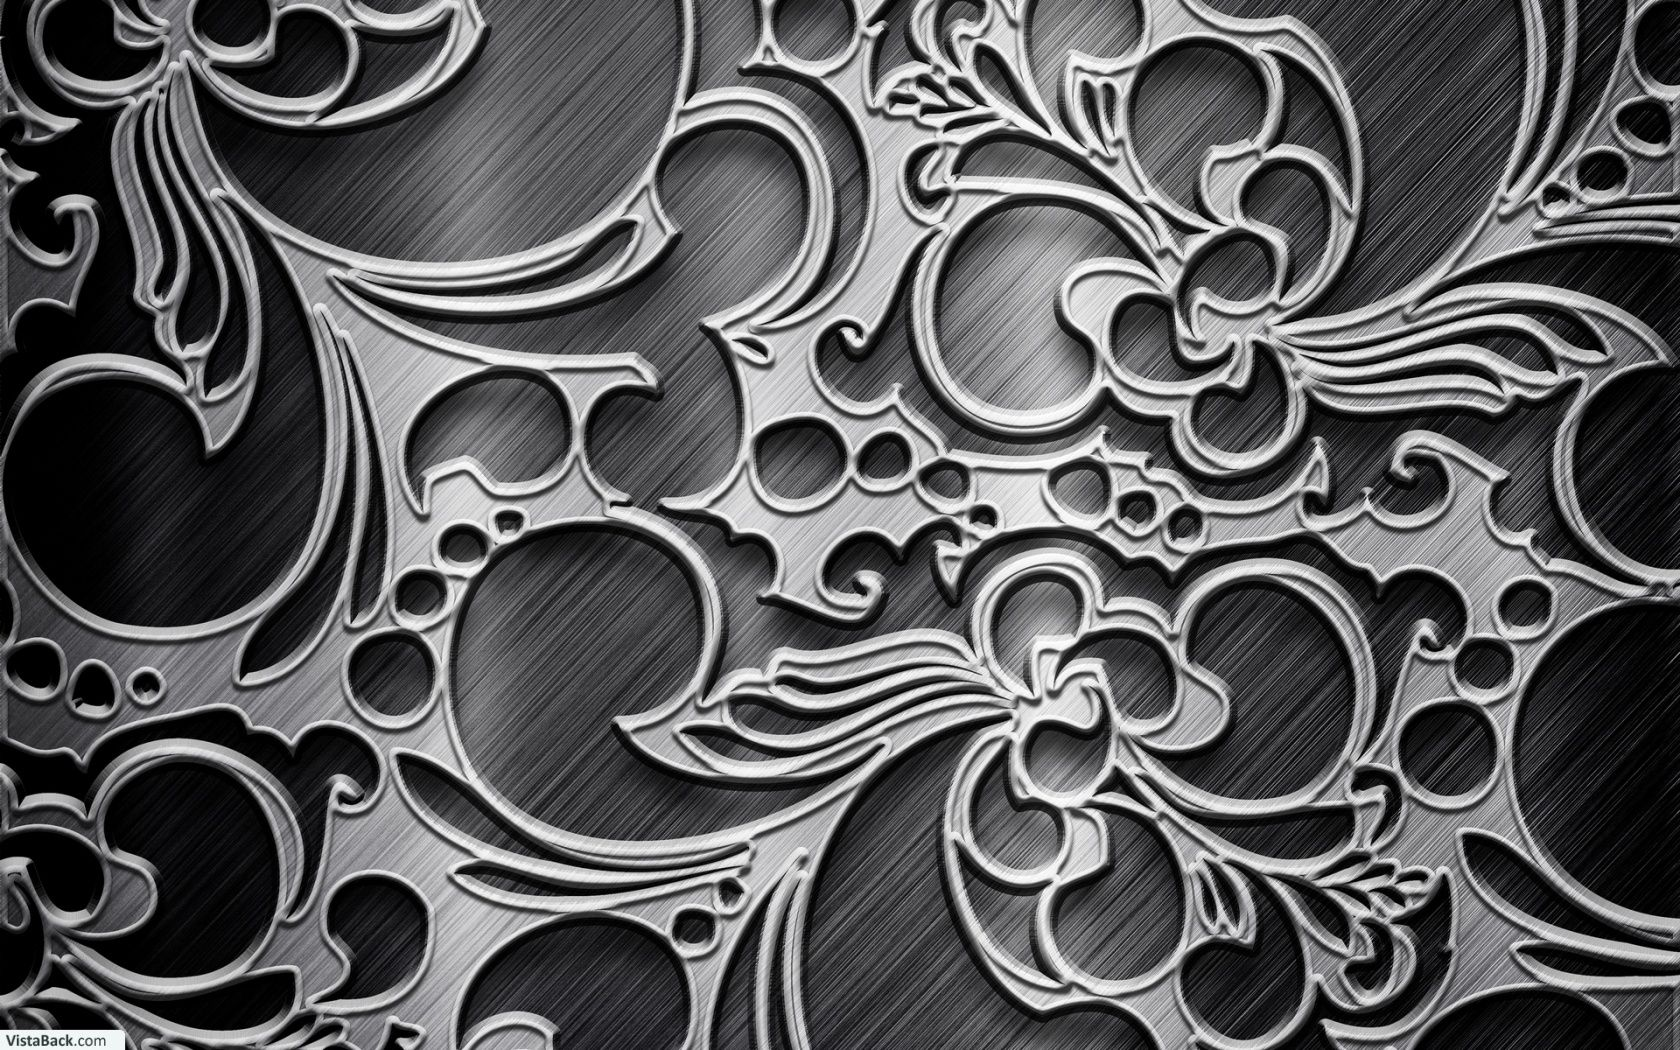 Texture Metallic Black Silver Pattern Wallpaper Silver Wallpaper